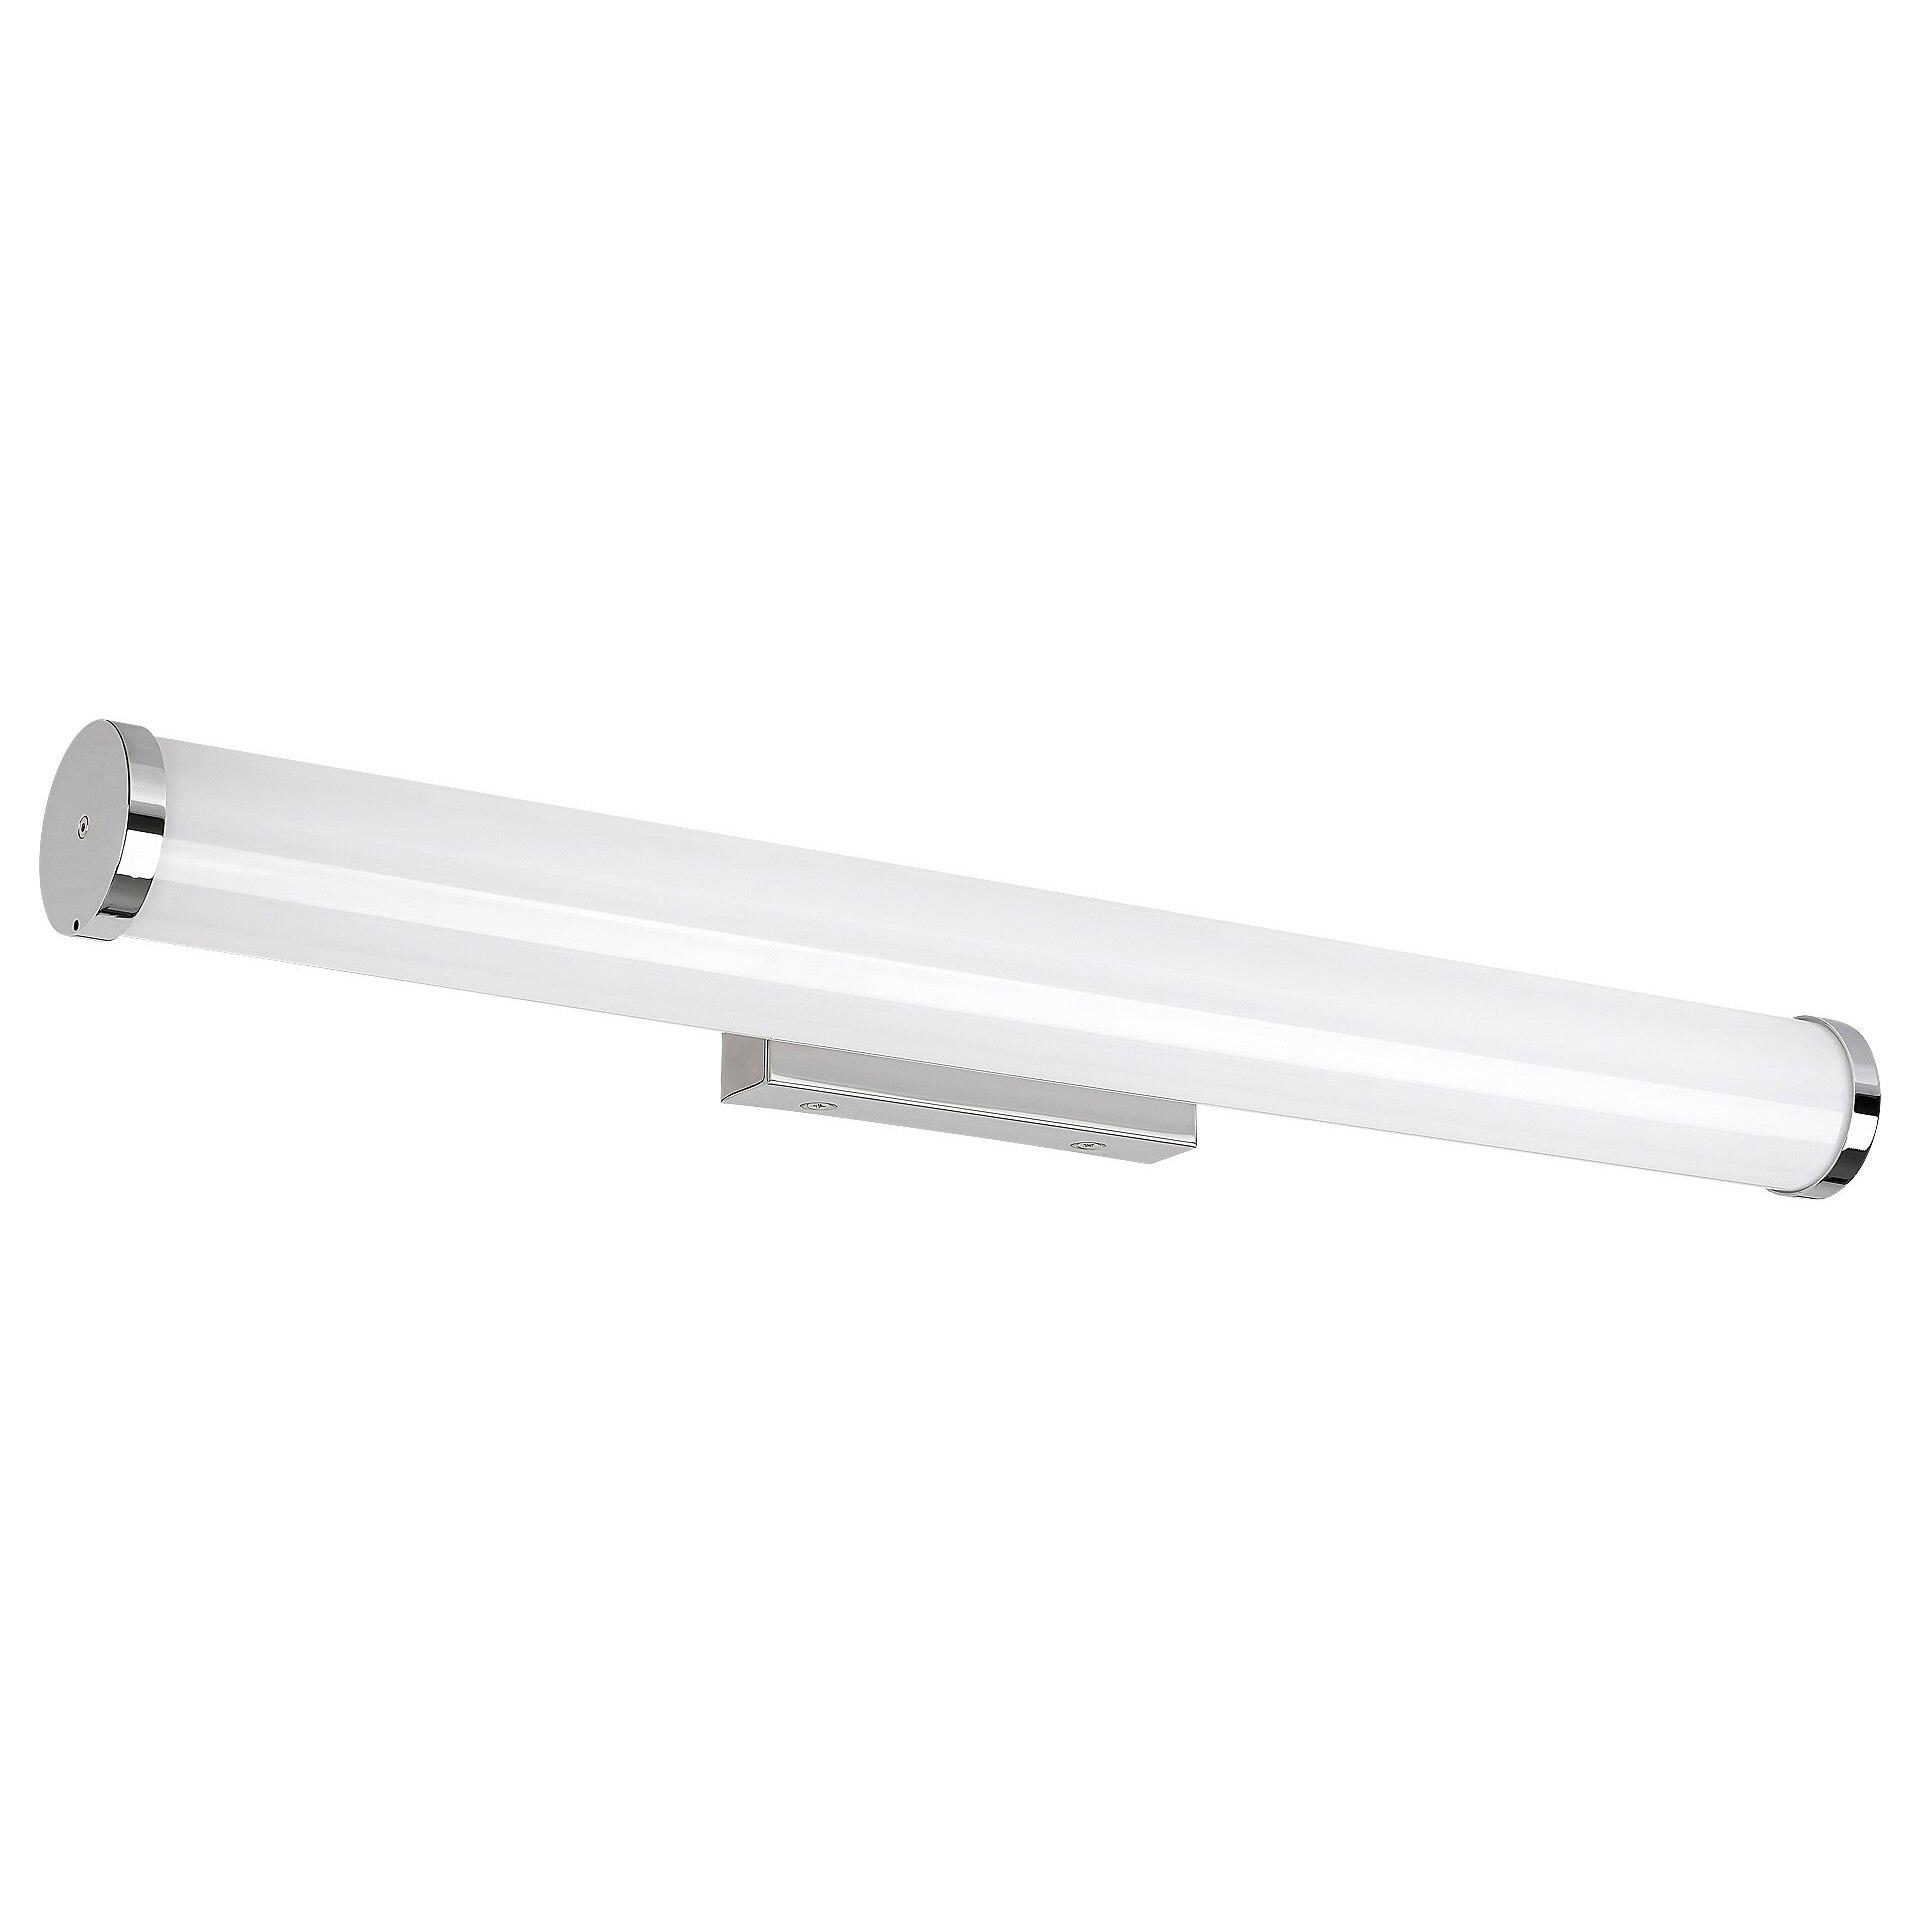 Fotografie Aplica LED integrat pentru baie Rabalux Sonja, 6W, 450 lm, IP44, A+, lumina alba naturala (4000K), 34 cm